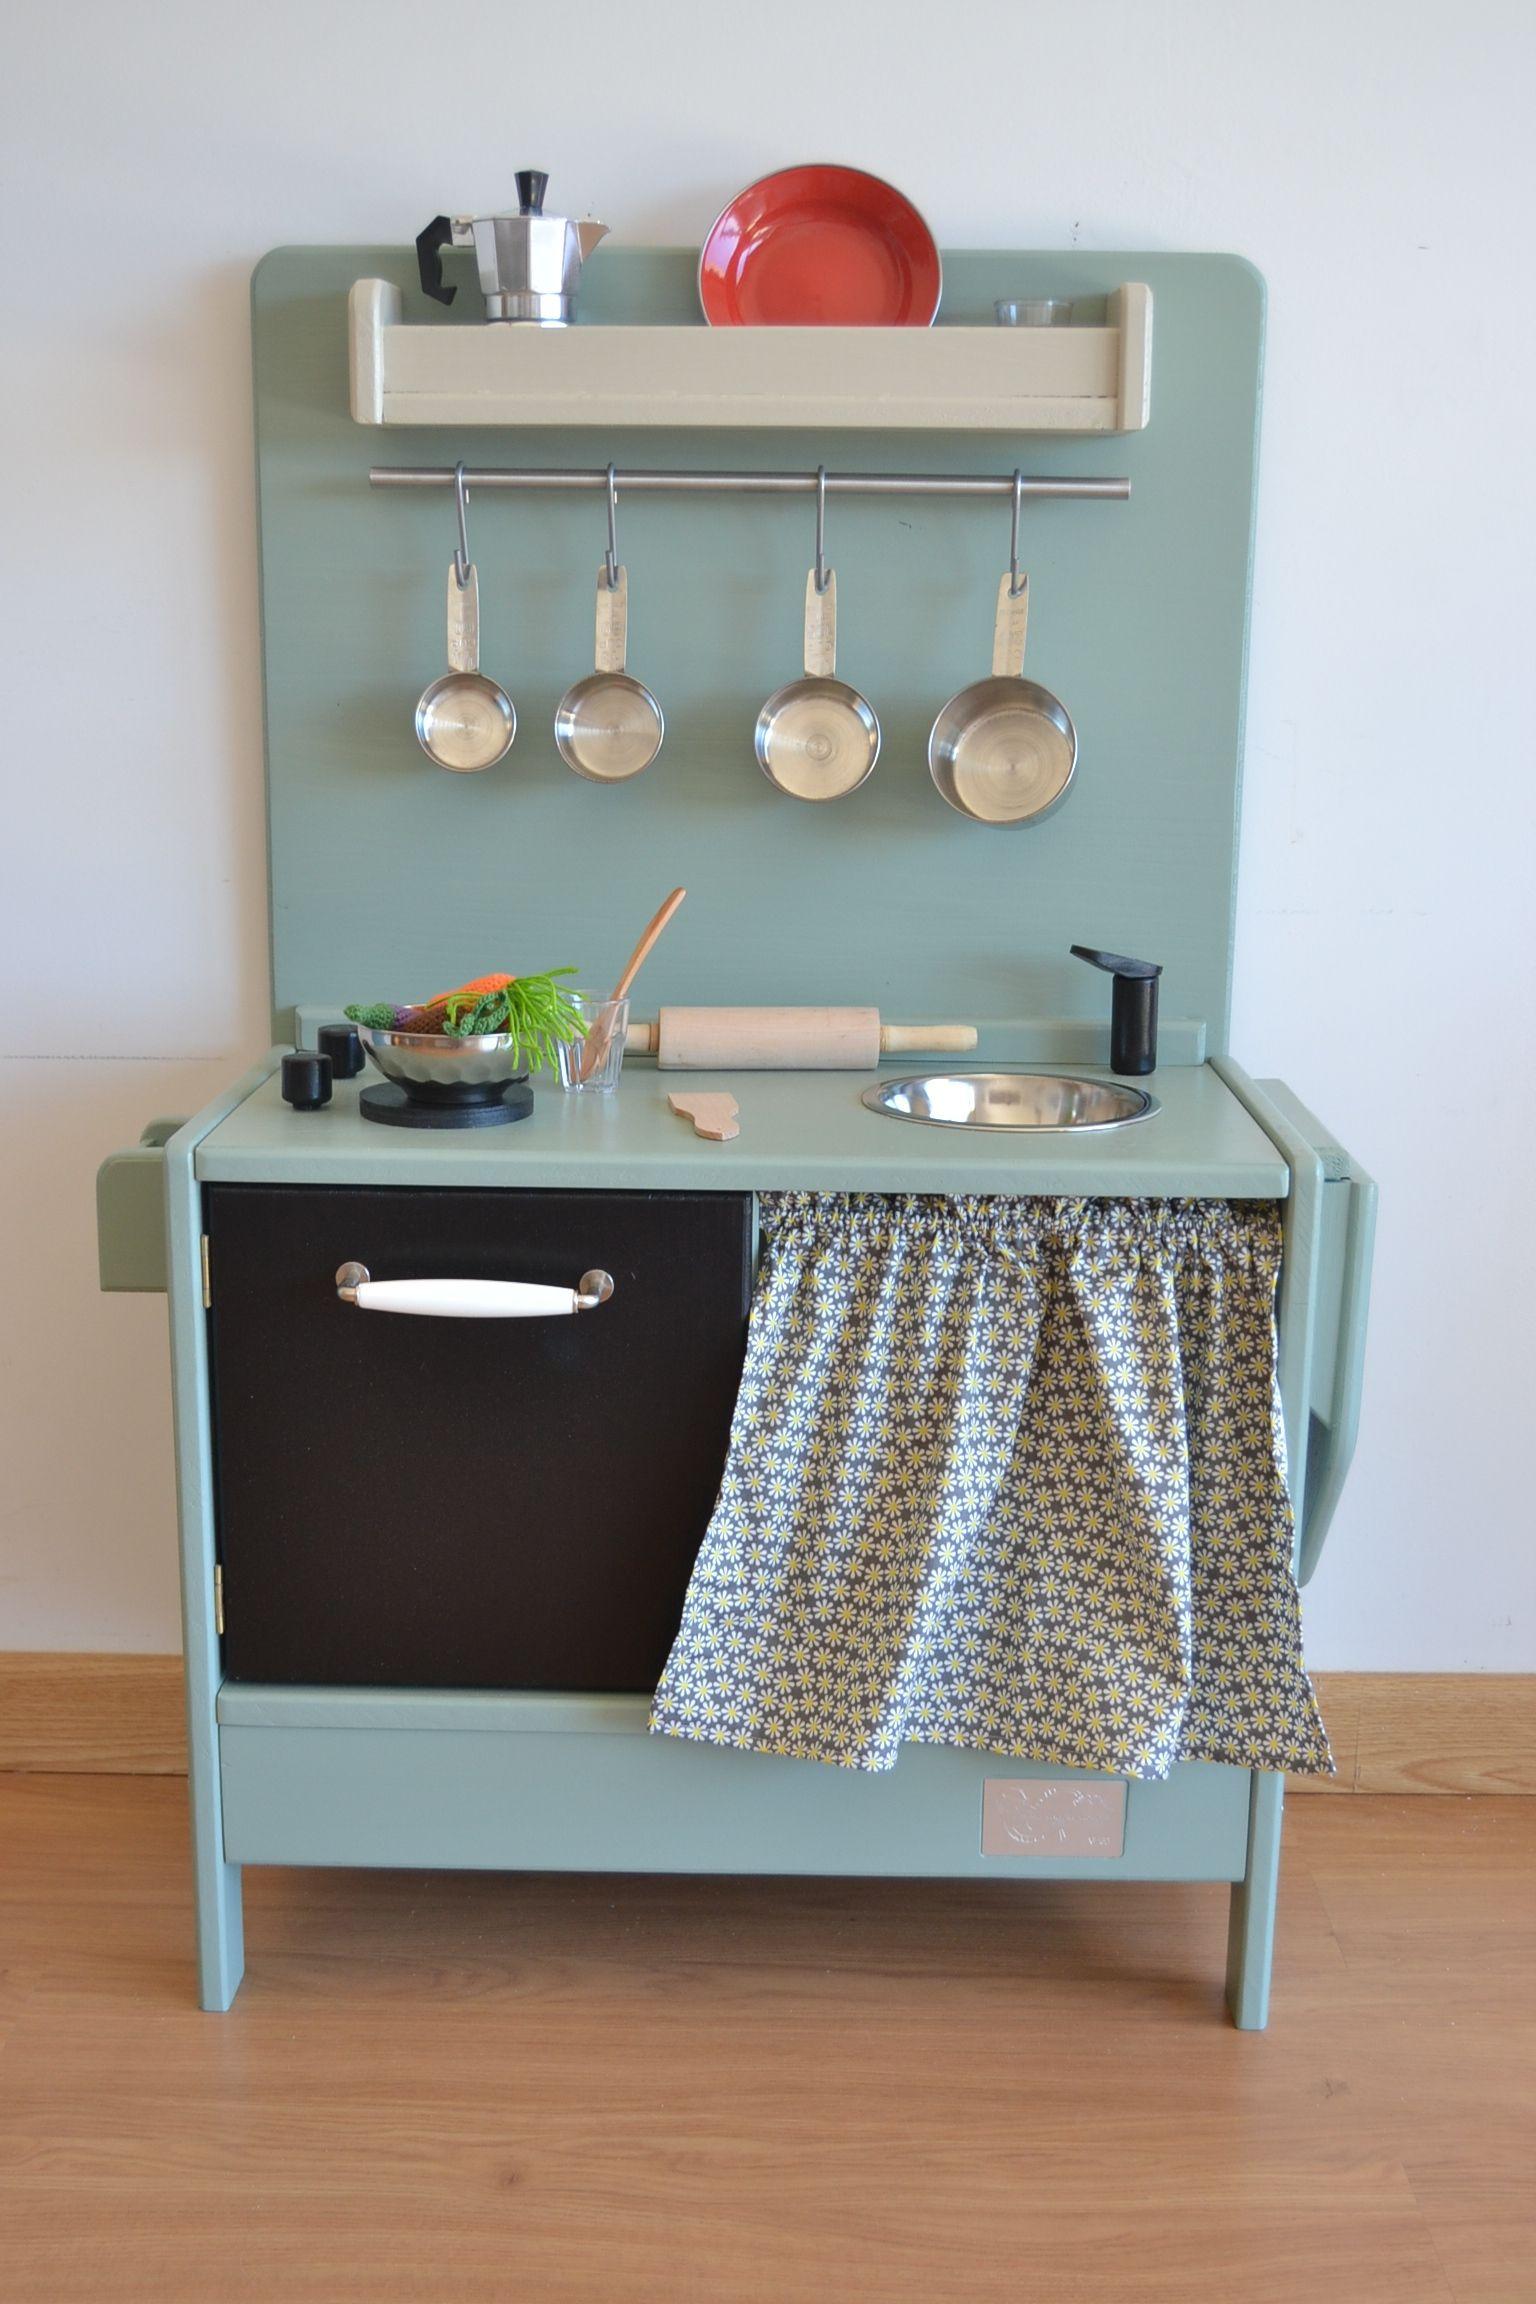 Exelent Toy Kitchens Pattern - Kitchen Cabinets | Ideas ...